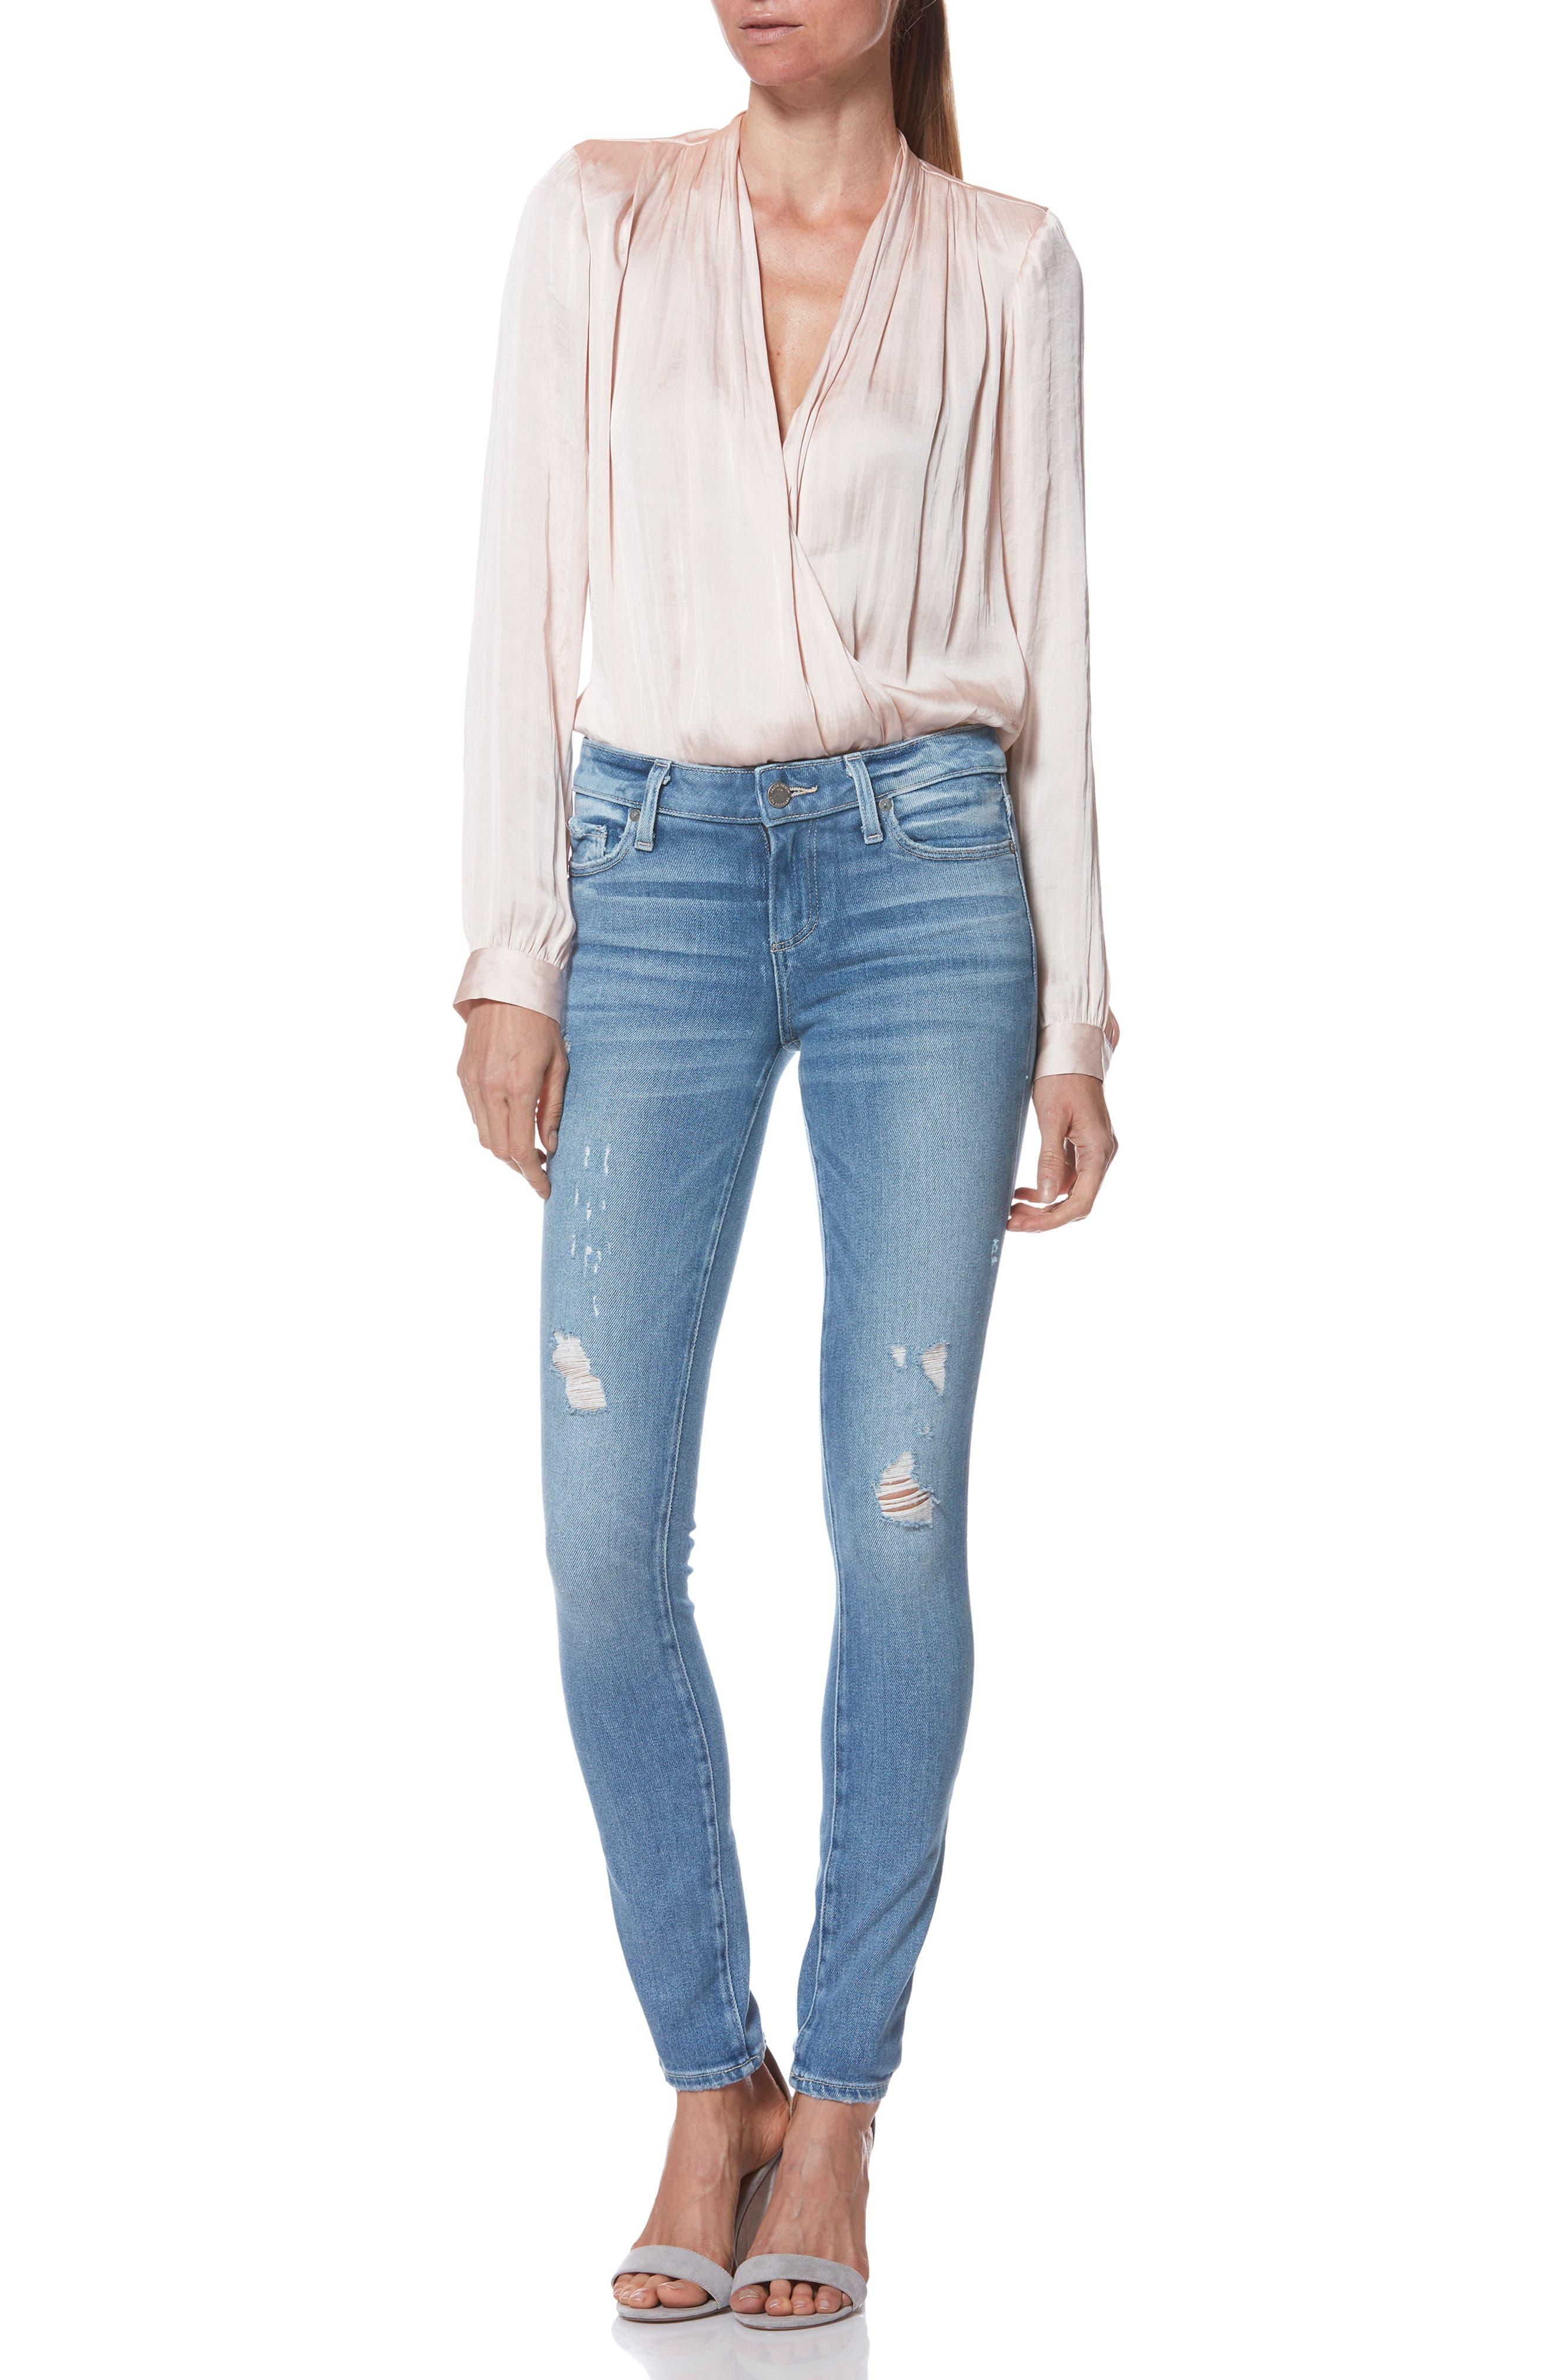 PAIGE,                             Verdugo Ultra Skinny Jeans,                             Alternate thumbnail 8, color,                             KAYSON DISTRESSED